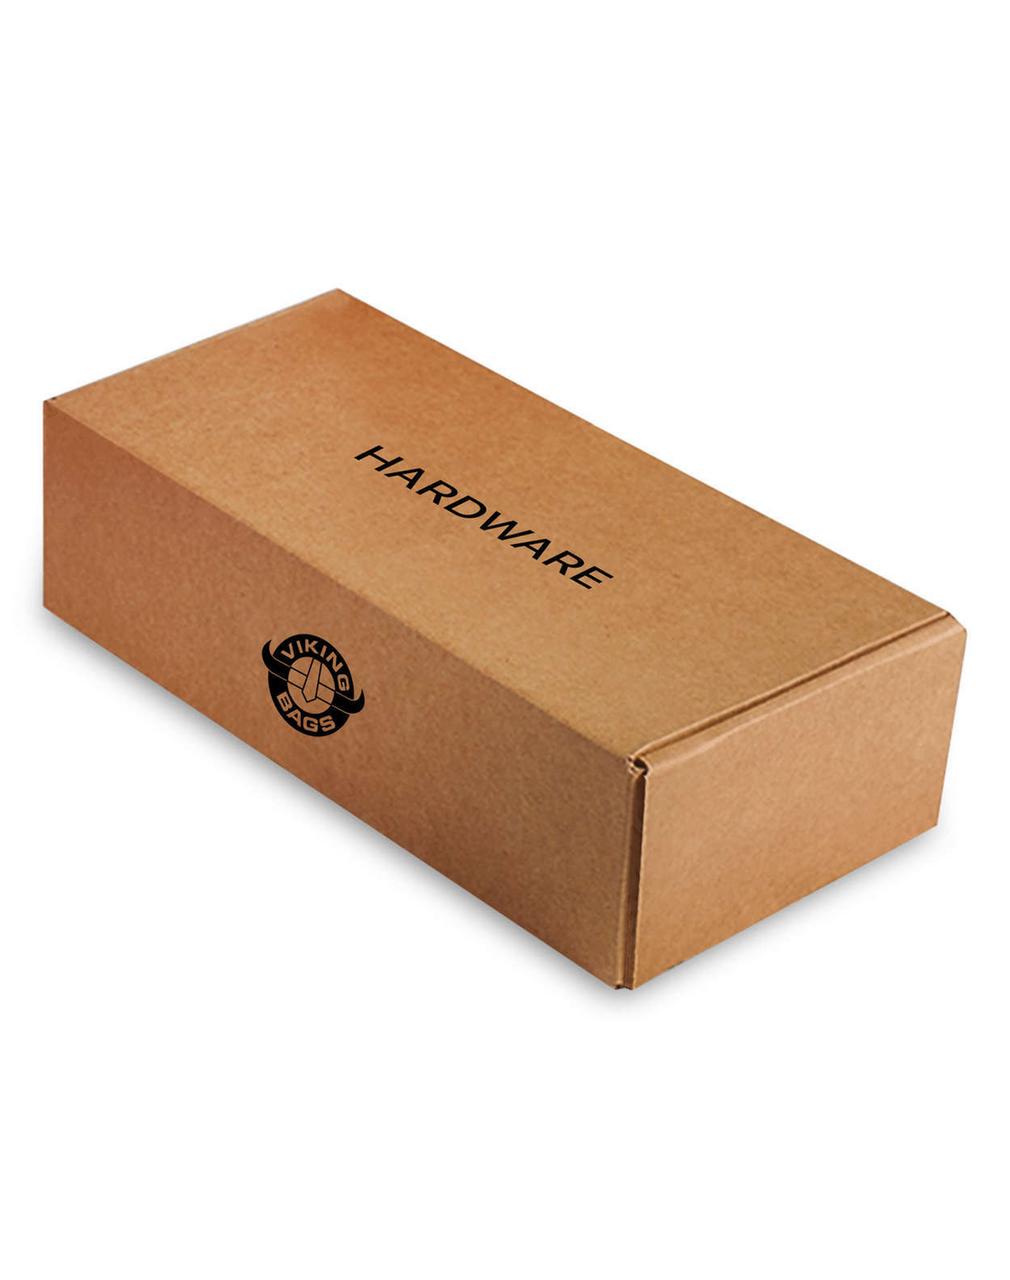 Triumph Thunderbird Charger Slanted Medium Motorcycle Saddlebags Box